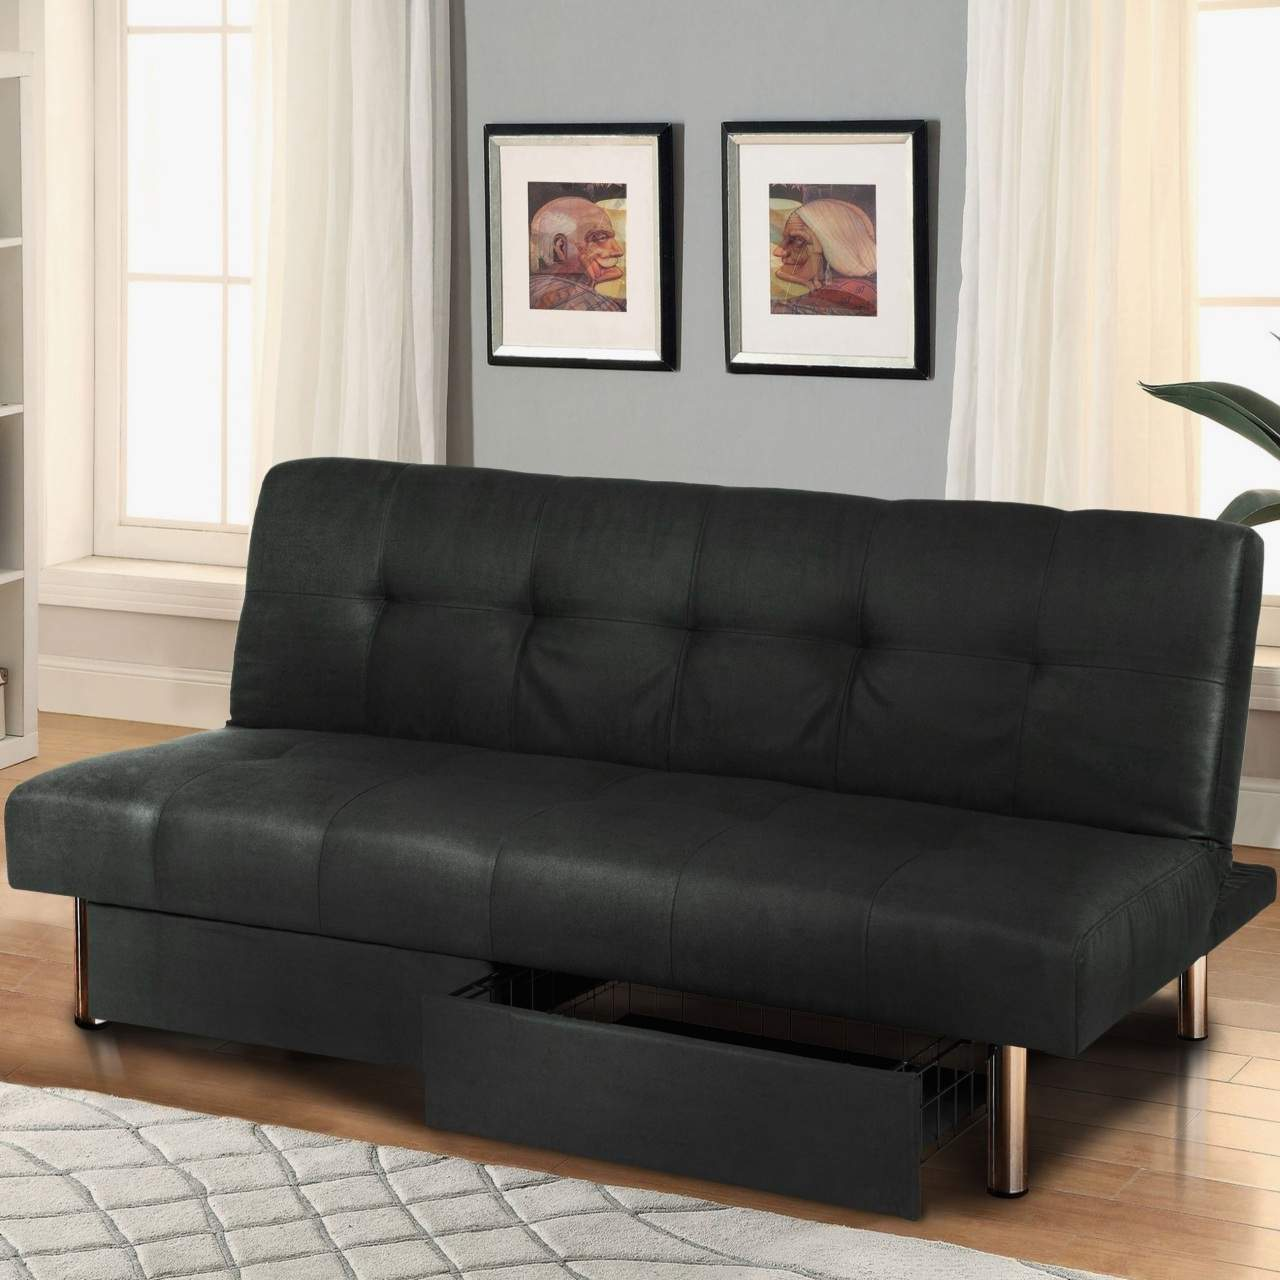 sofa mit recamiere blau shredyr recamiere flg5xzje of samt sessel blau